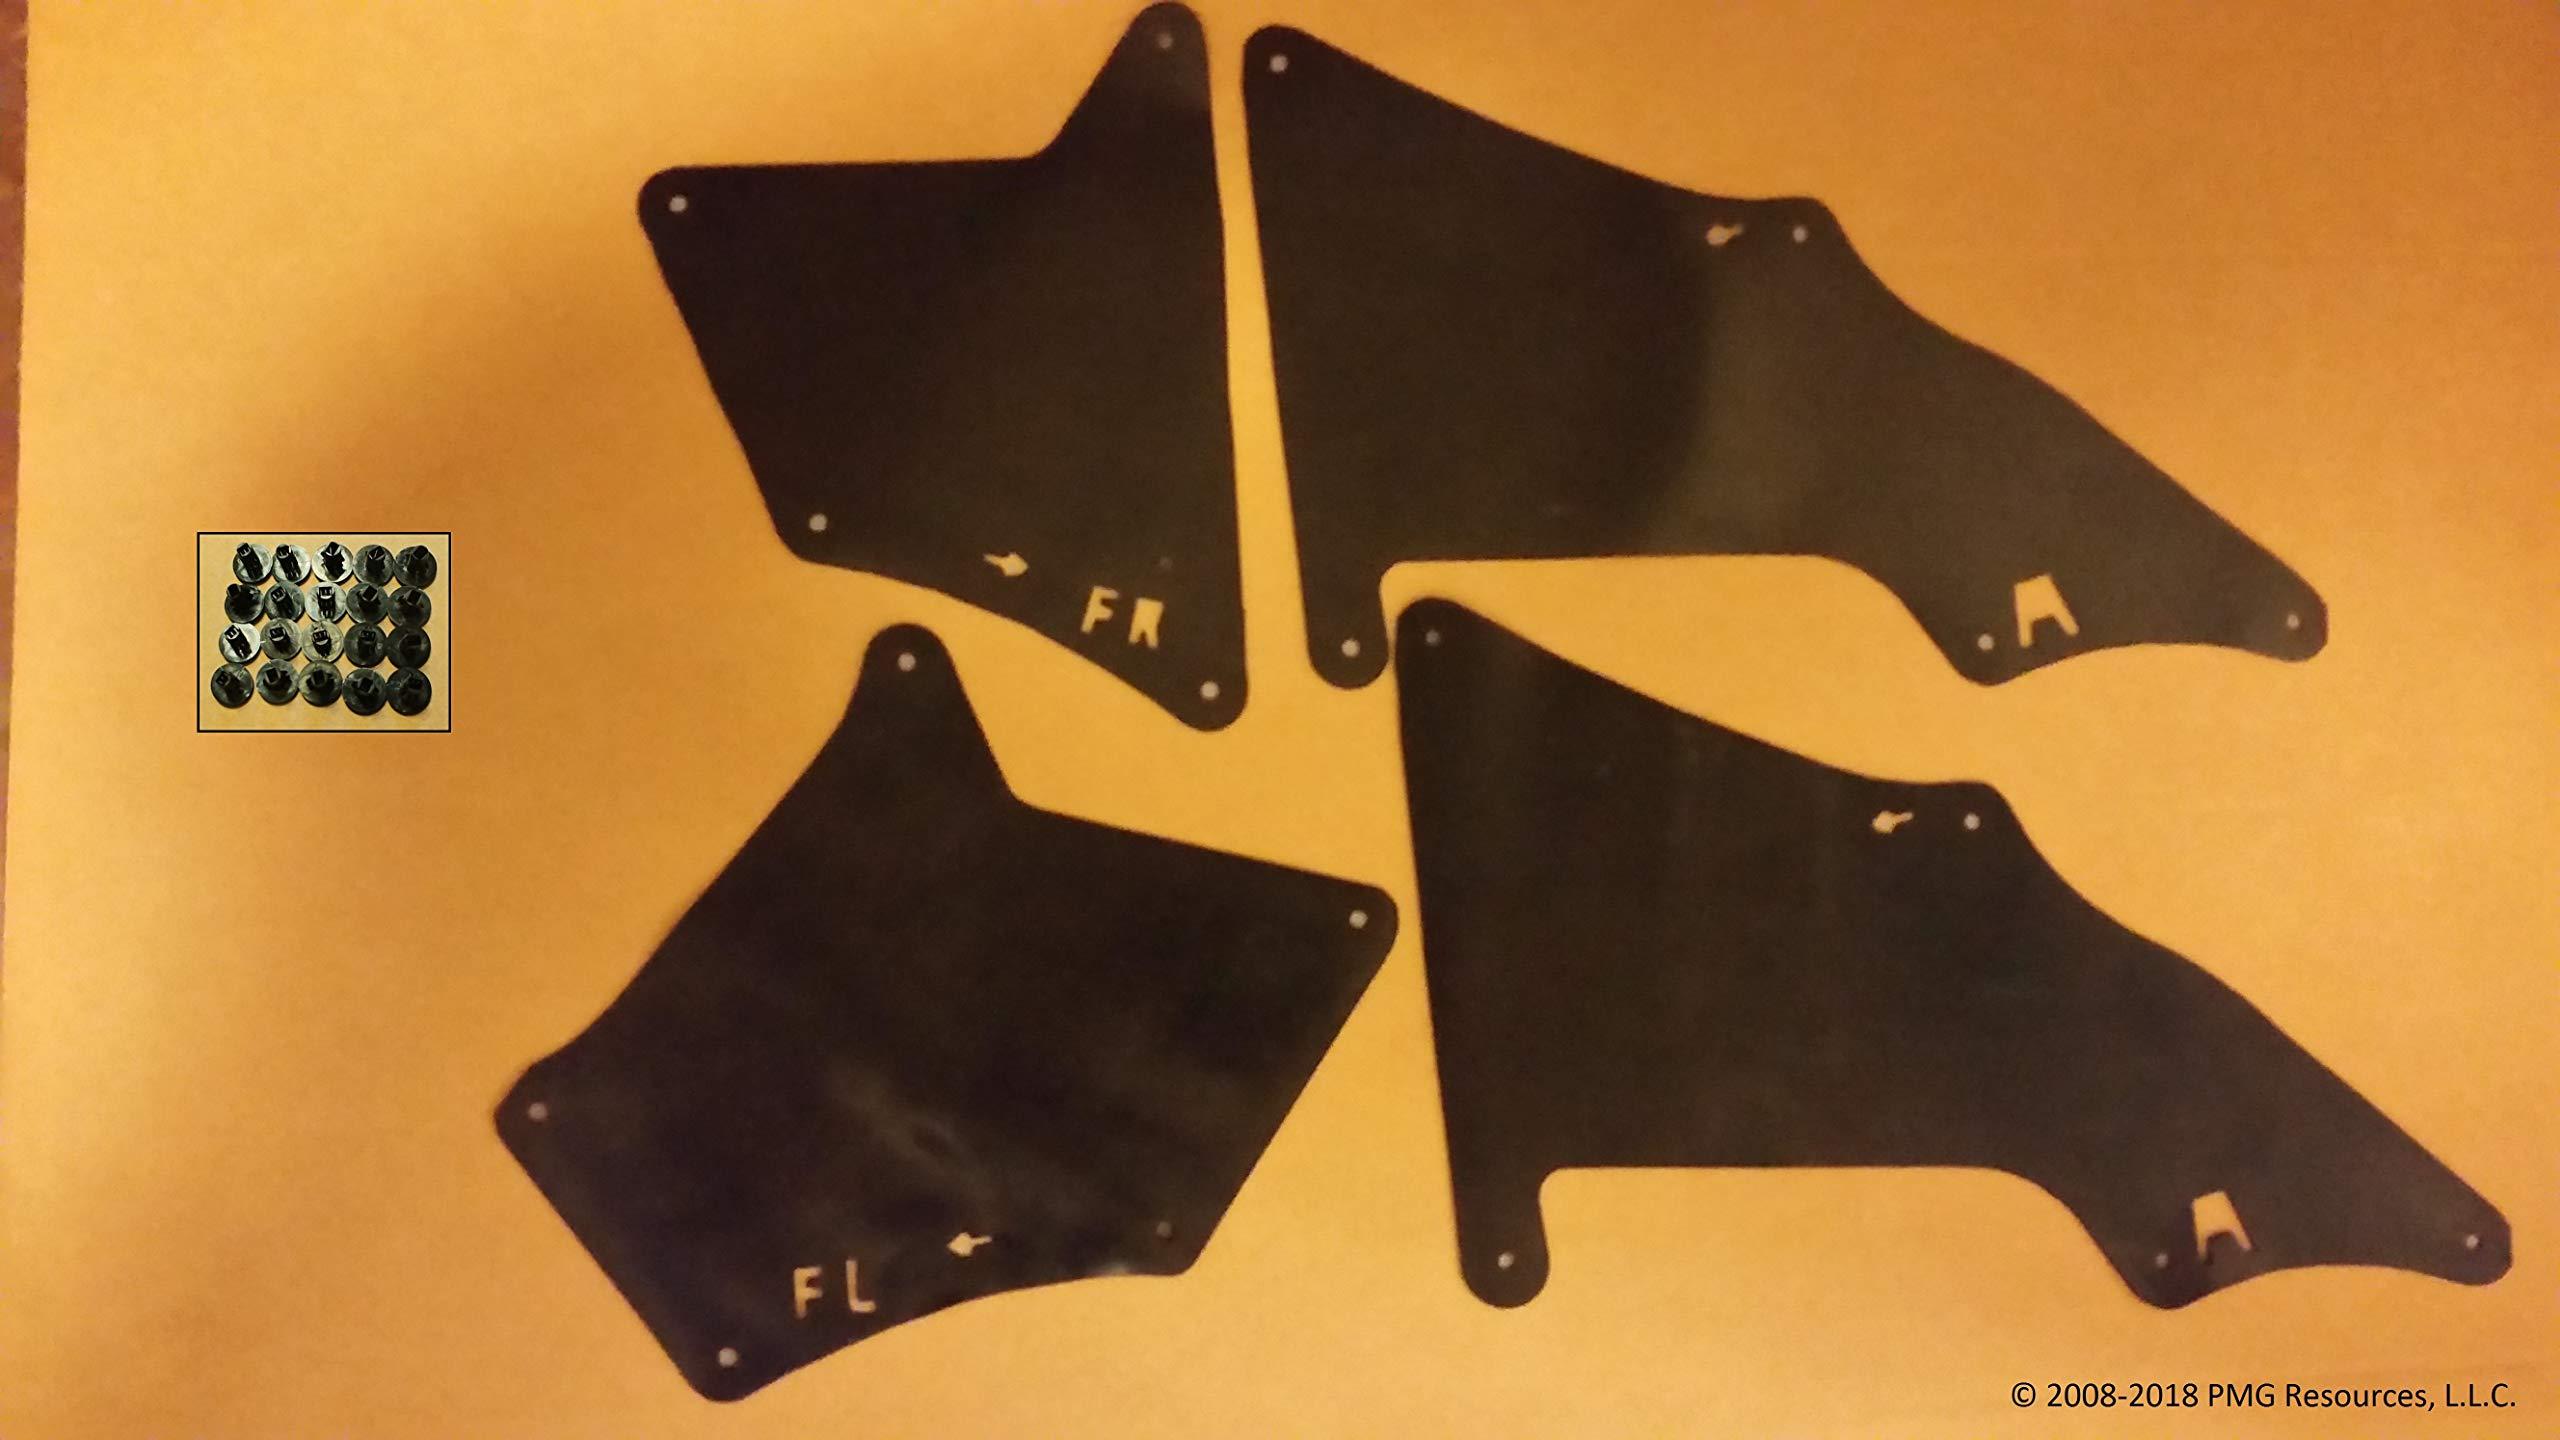 Yota Liners Set of Four Splash Shields with Clips for 4Runner 2010-2018 (Fender Liner, Apron, Shield, Splash Guard, Skirt, Guard, Seal, Splash Seal) A